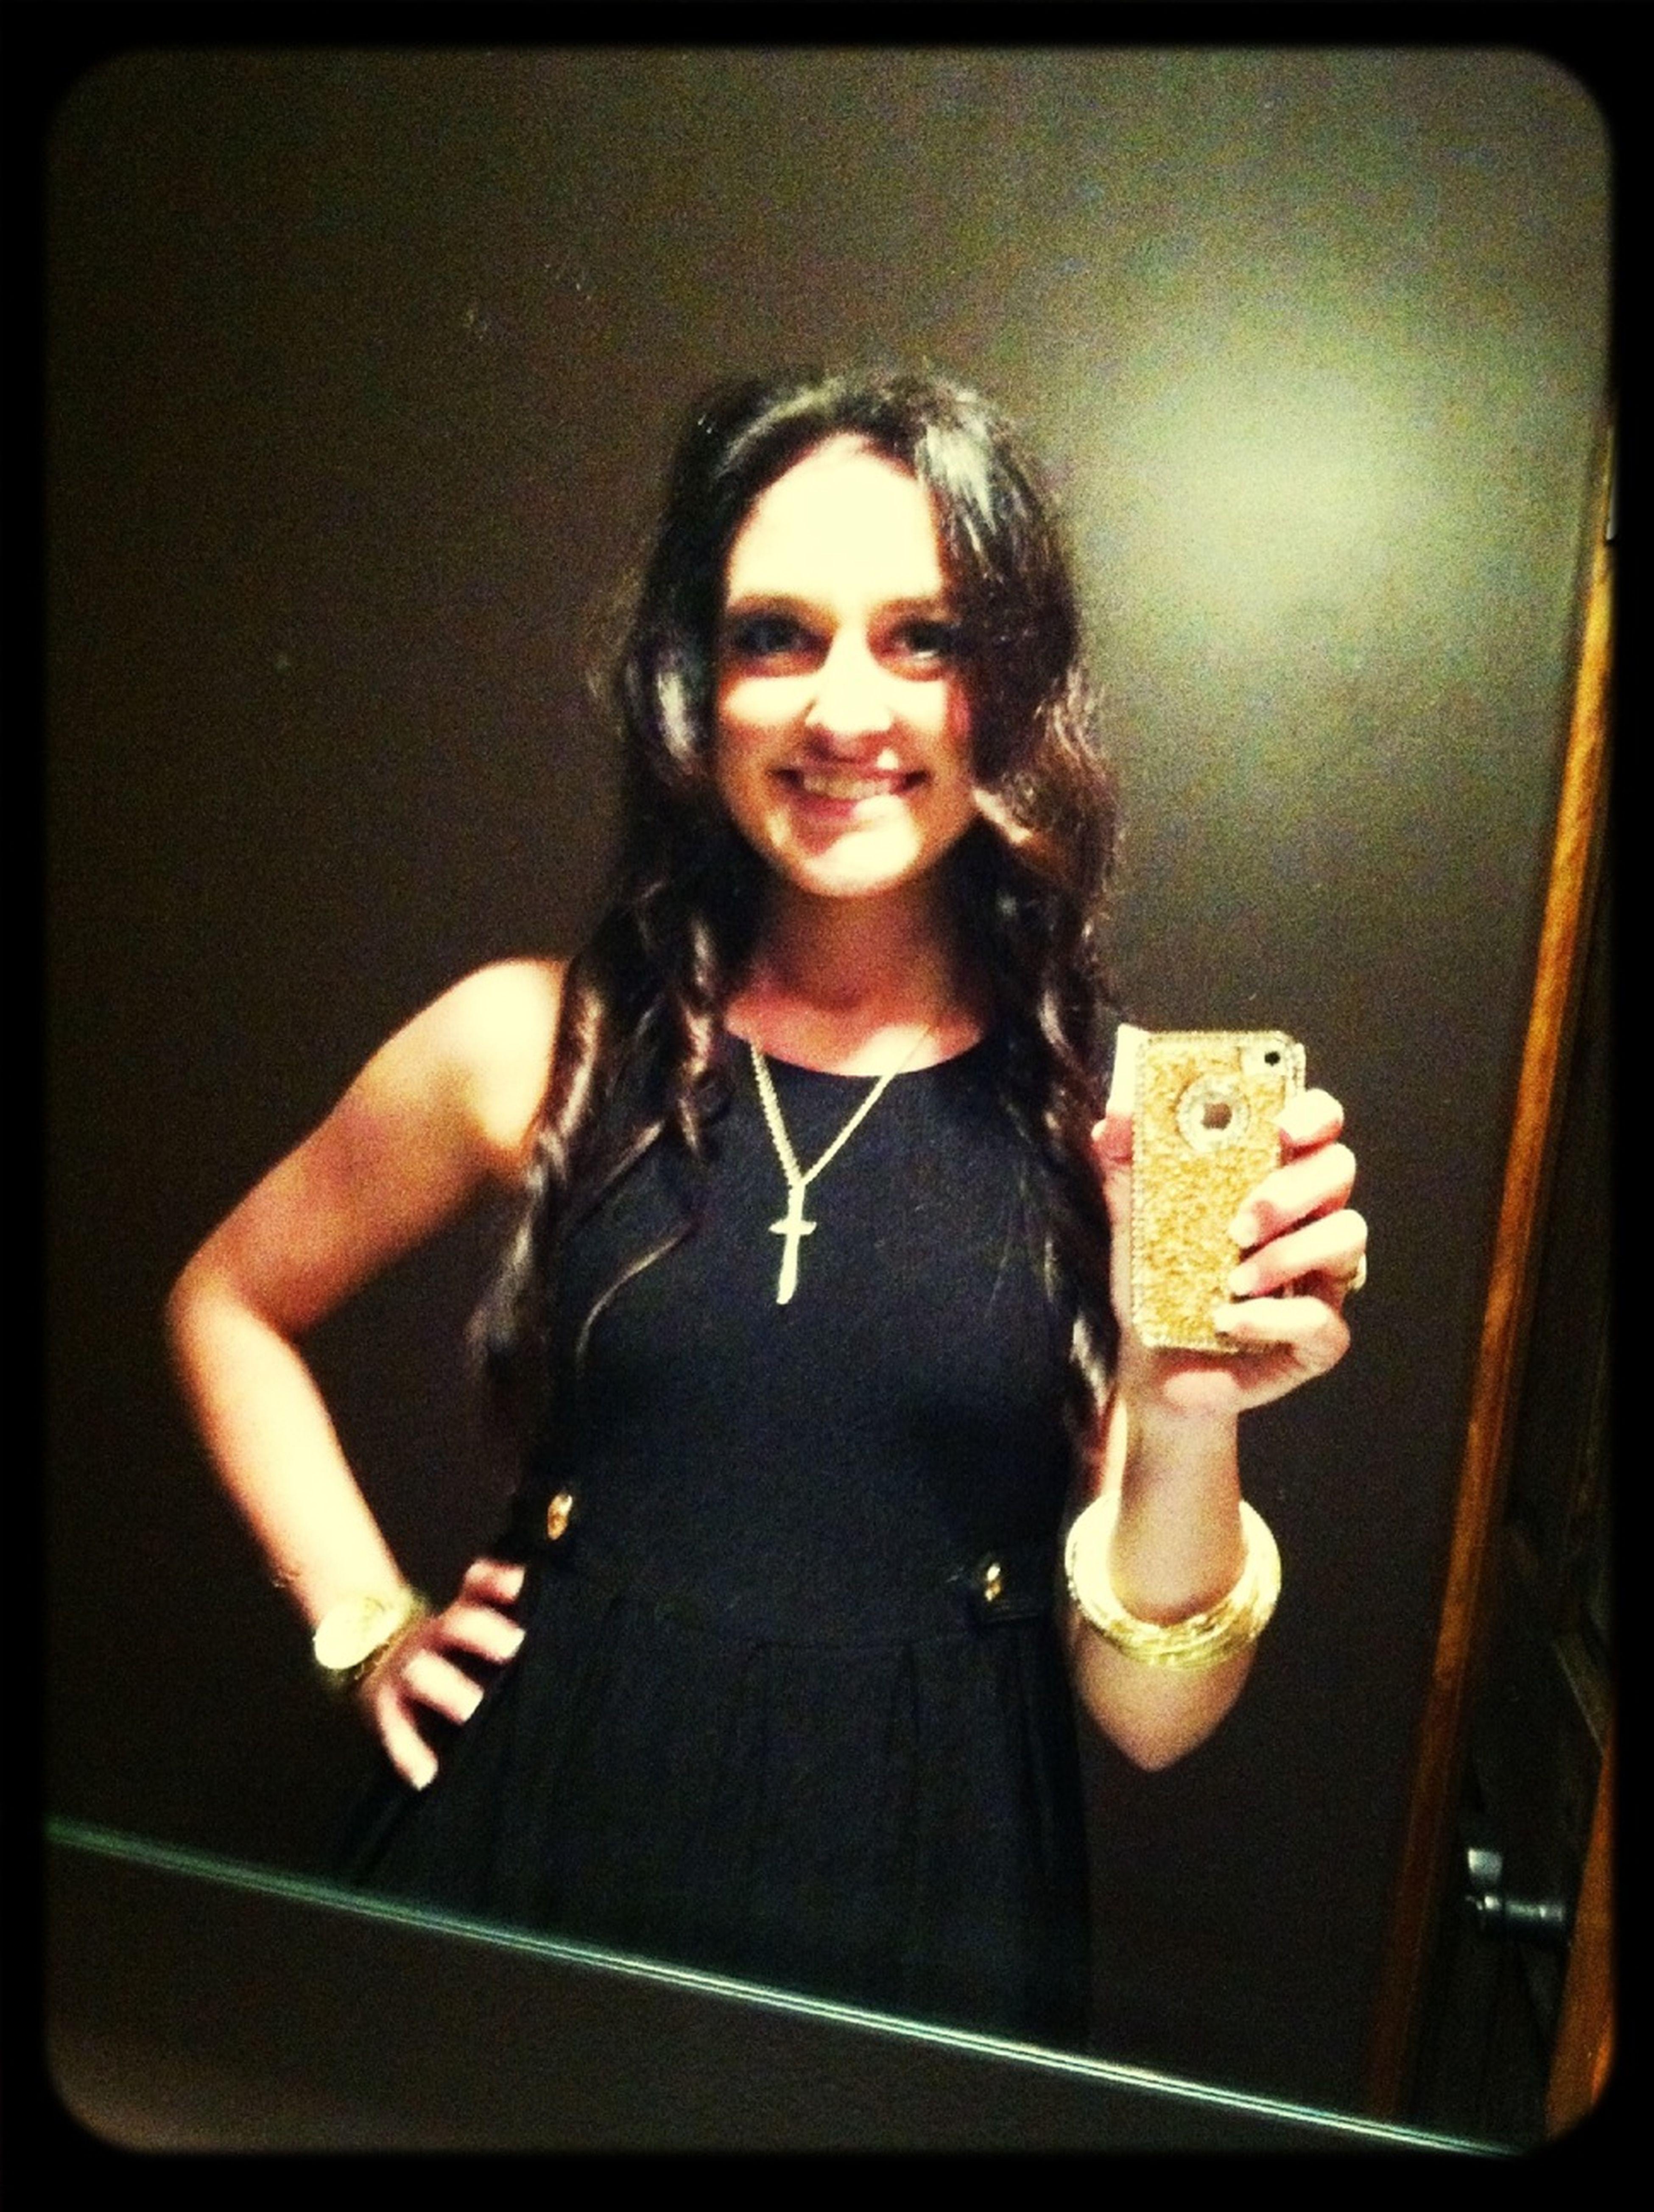 Christmas mirror pic :)